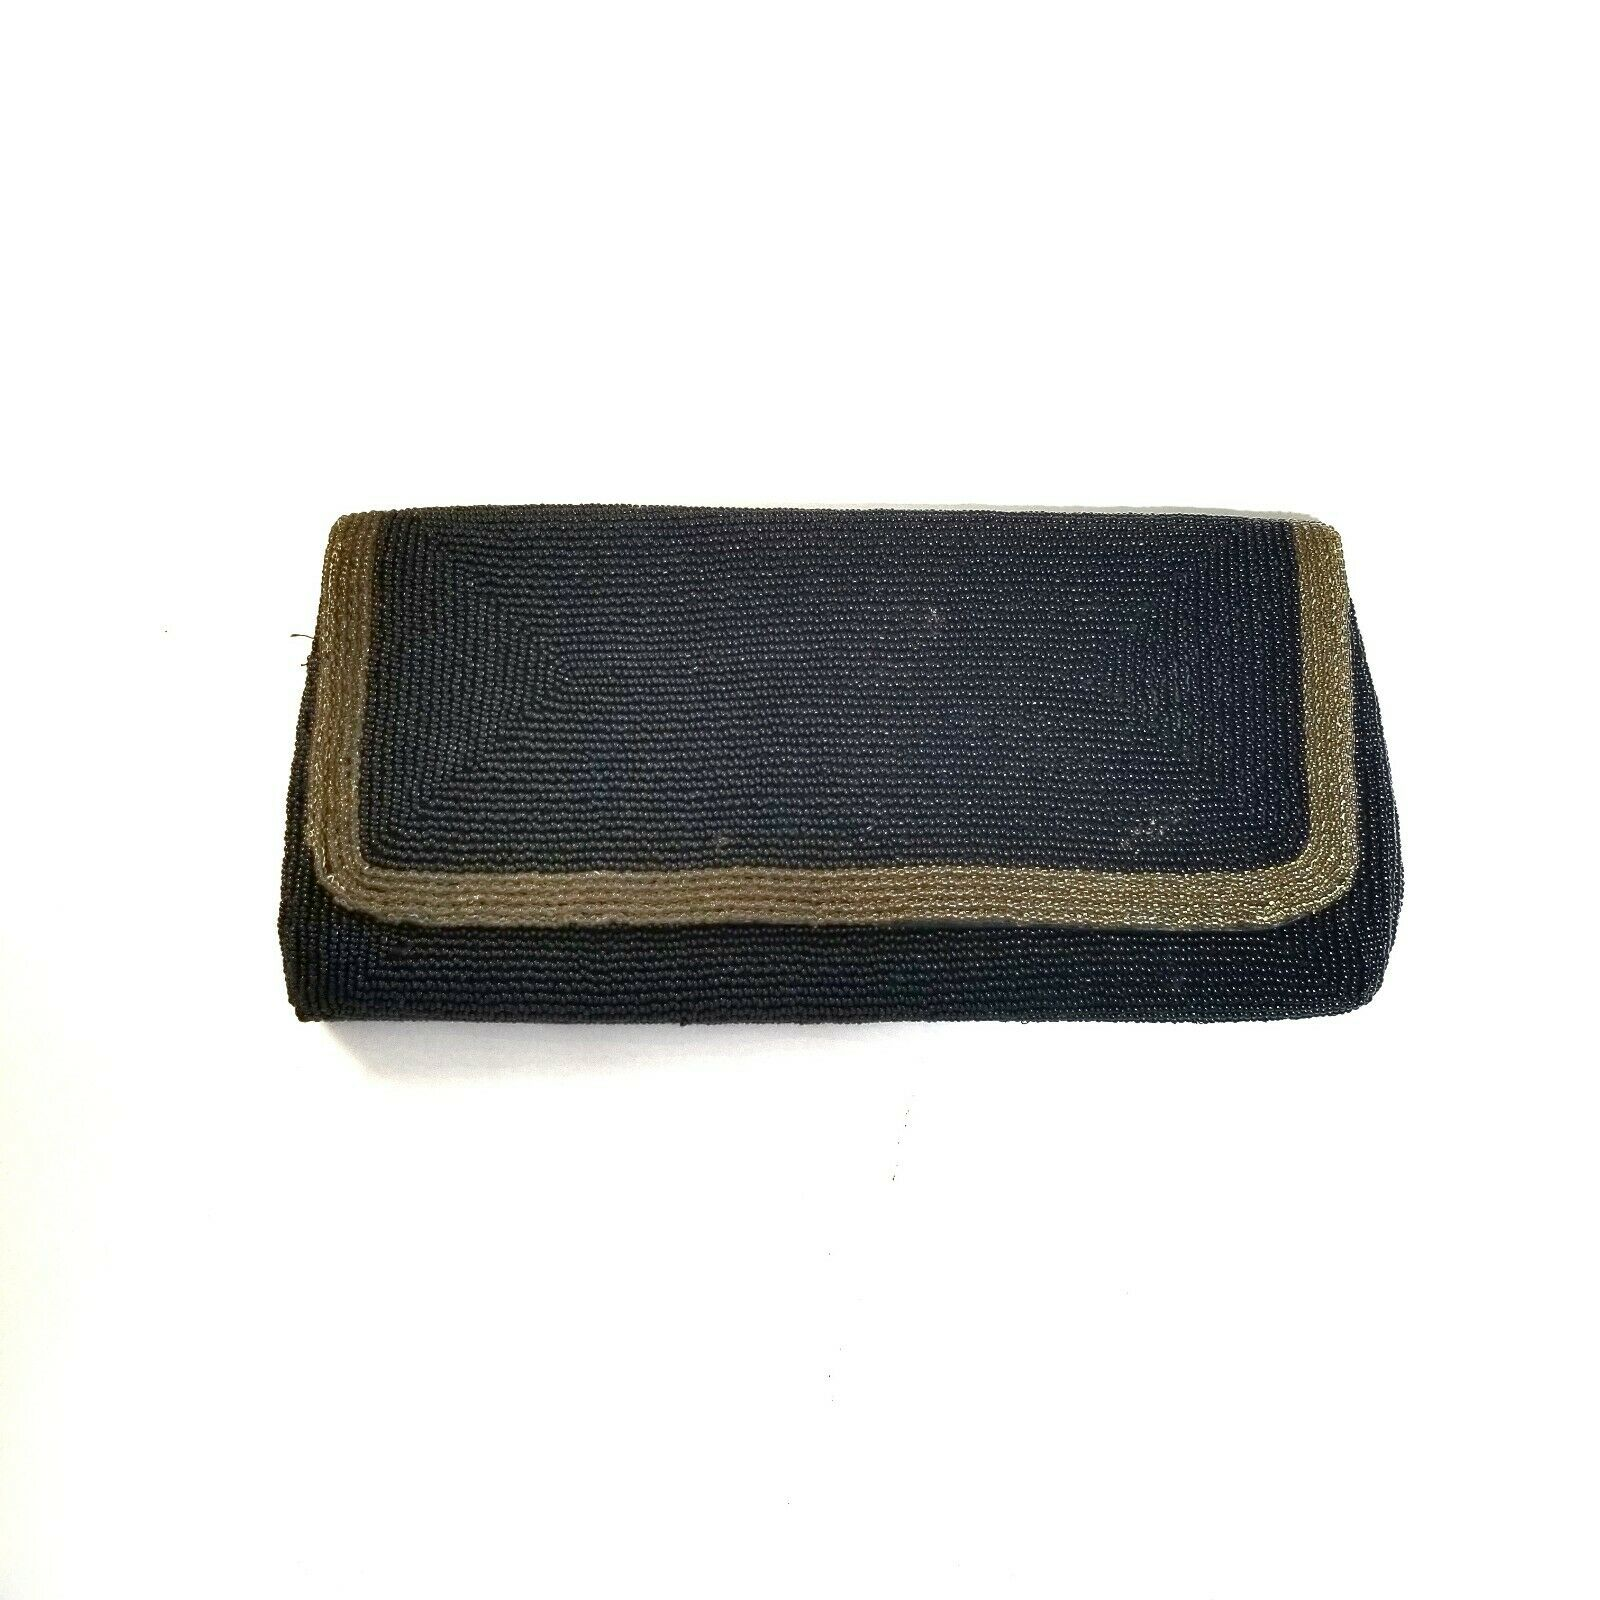 Vintage Walborg Black Gold Beaded Clutch Purse Pockets